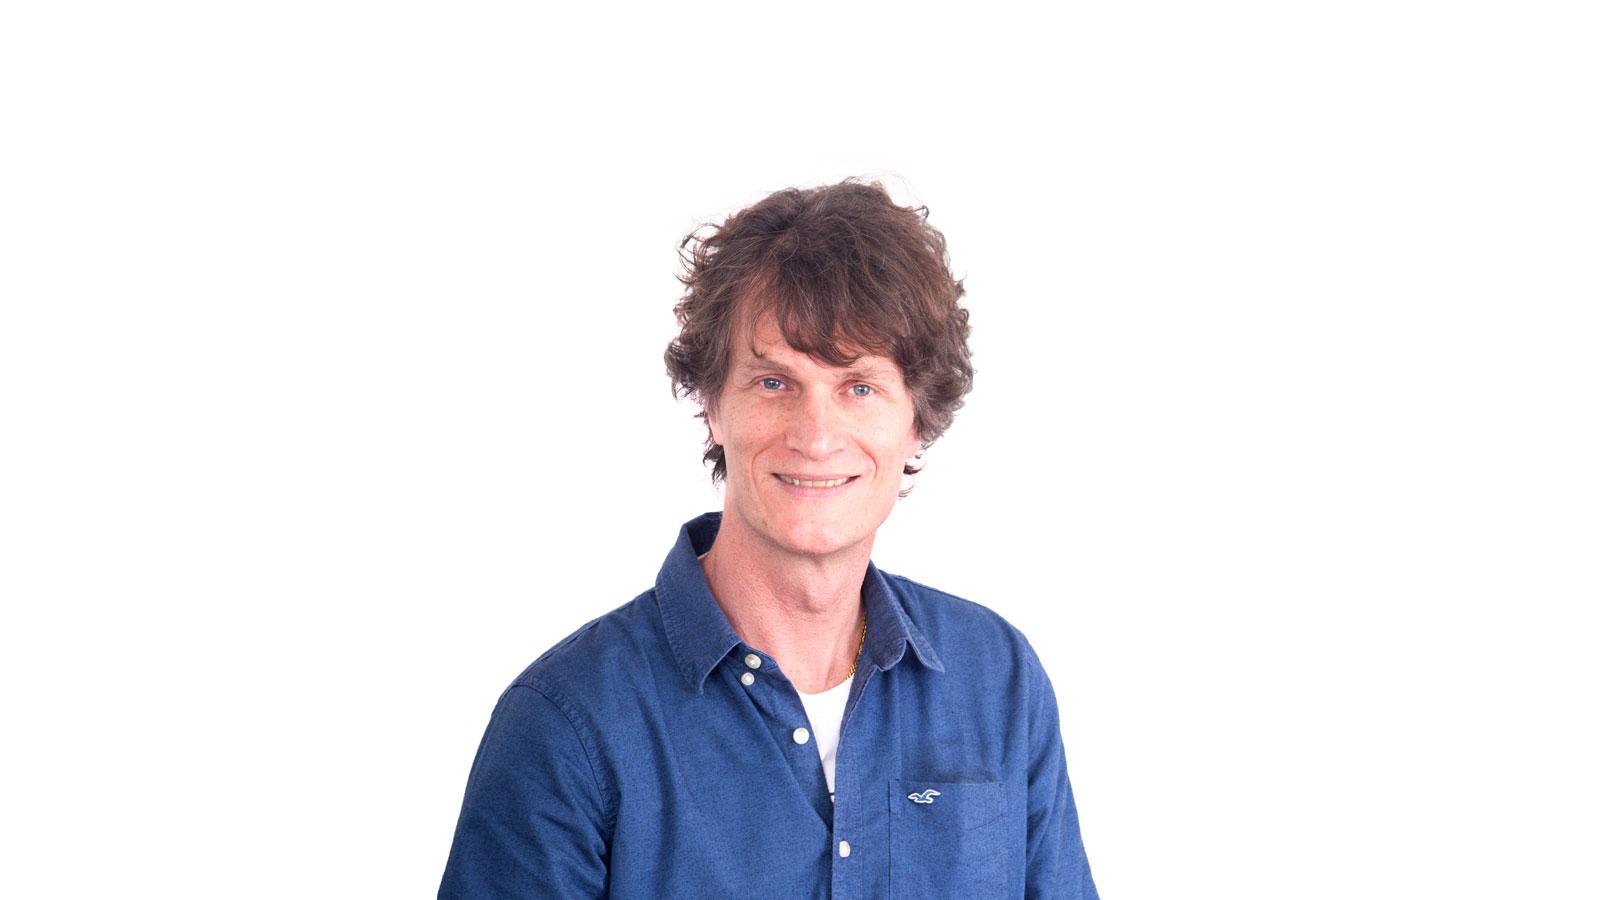 BitCar founder Gov van Ek: being an entrepreneur isn't for everyone